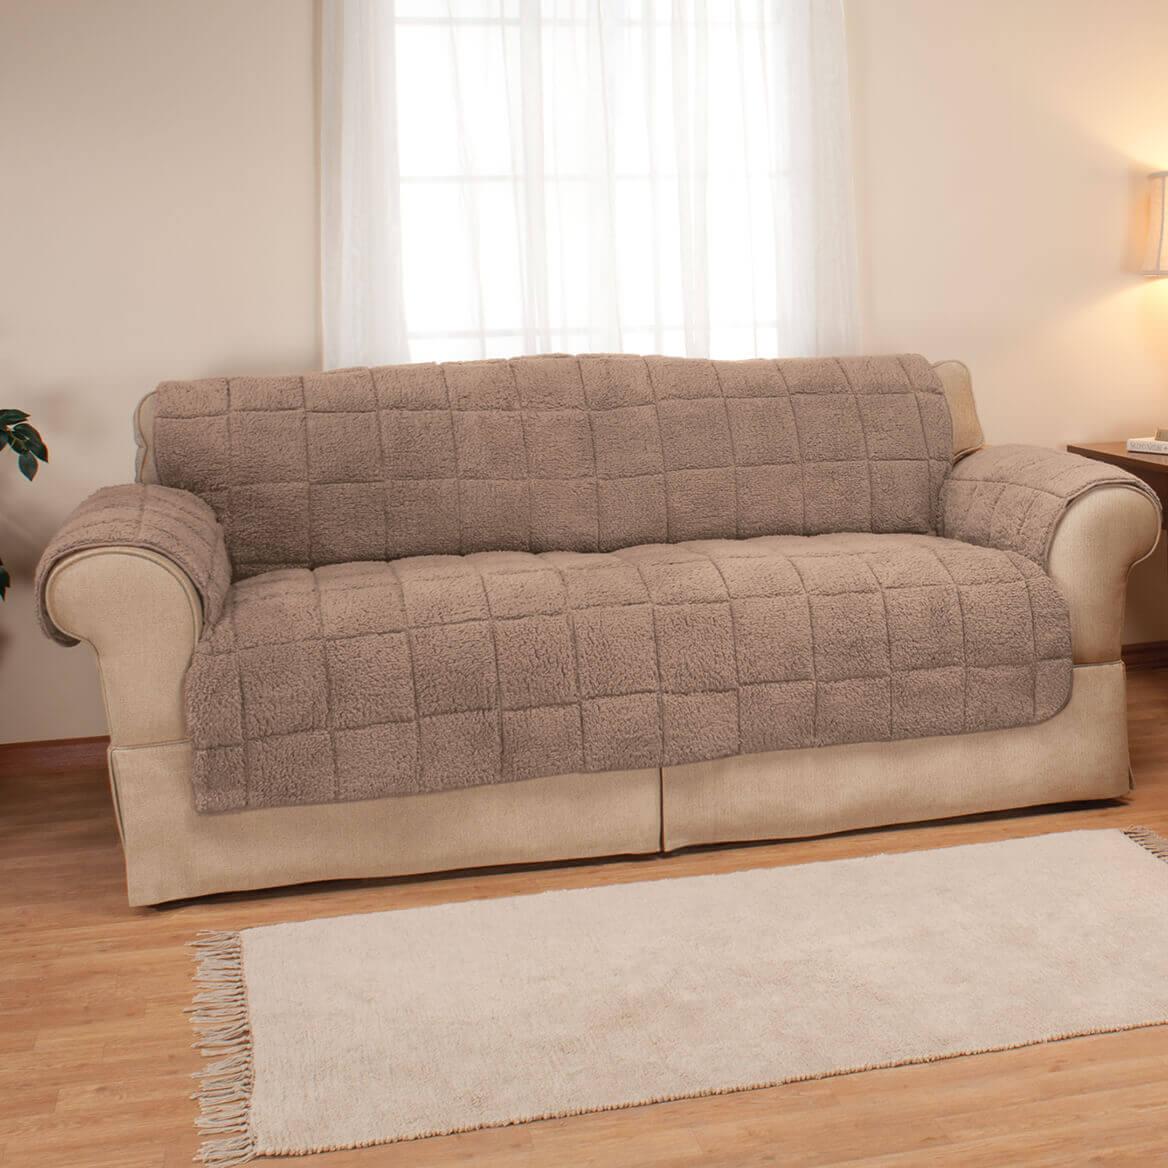 waterproof sofa protector records cologne sherpa by oakridge walter drake